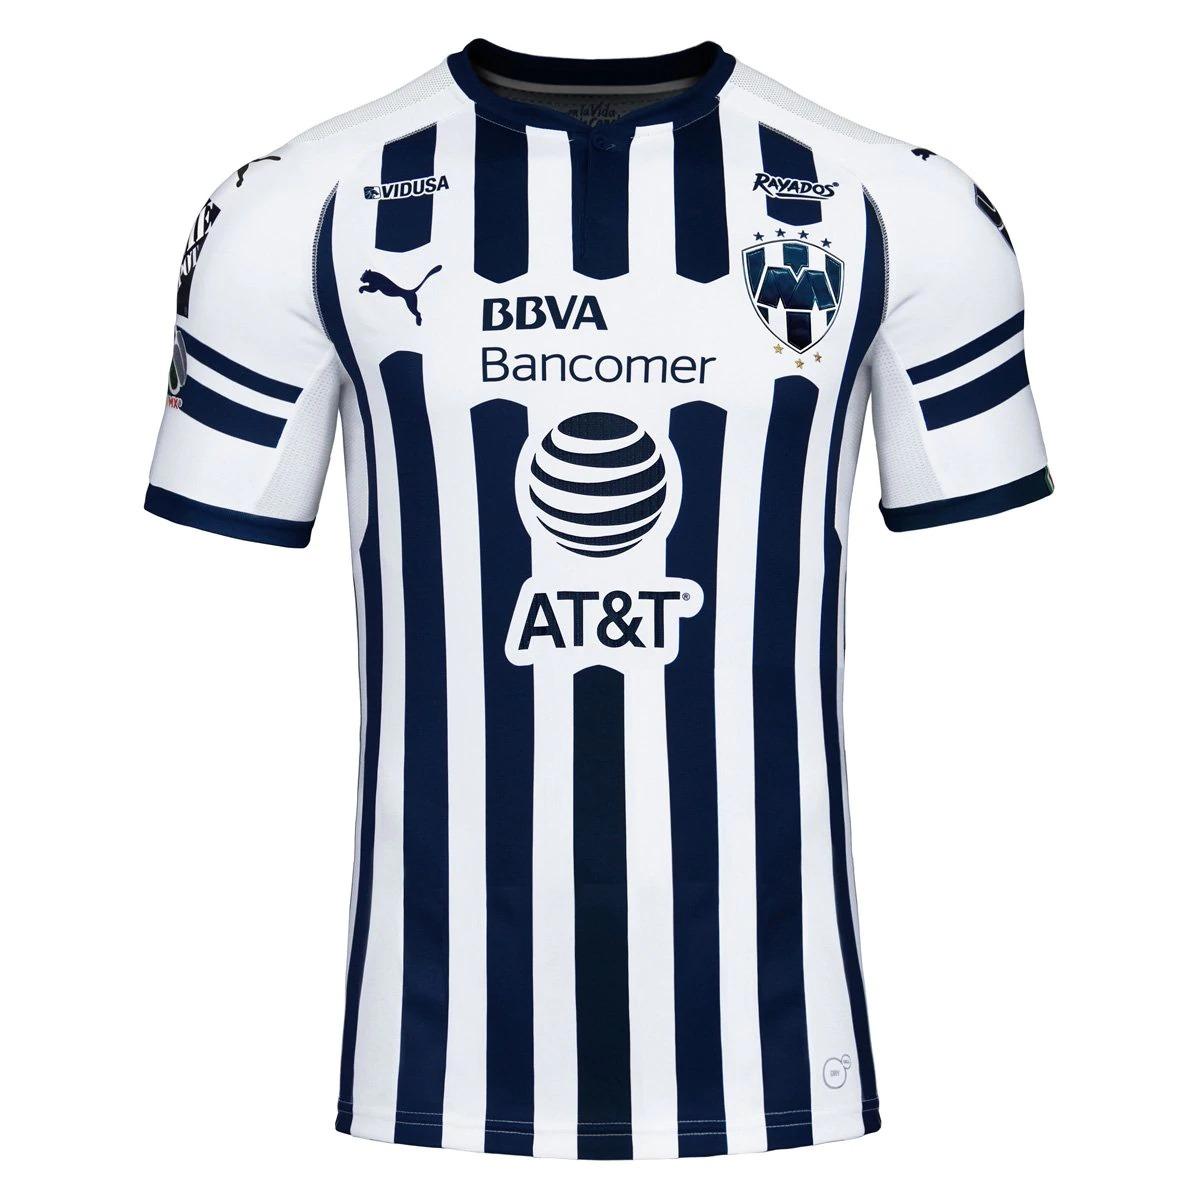 15aaeb286c5a8 Playera Jersey Rayados Local Monterrey 2018-2019 Funes Mori ...